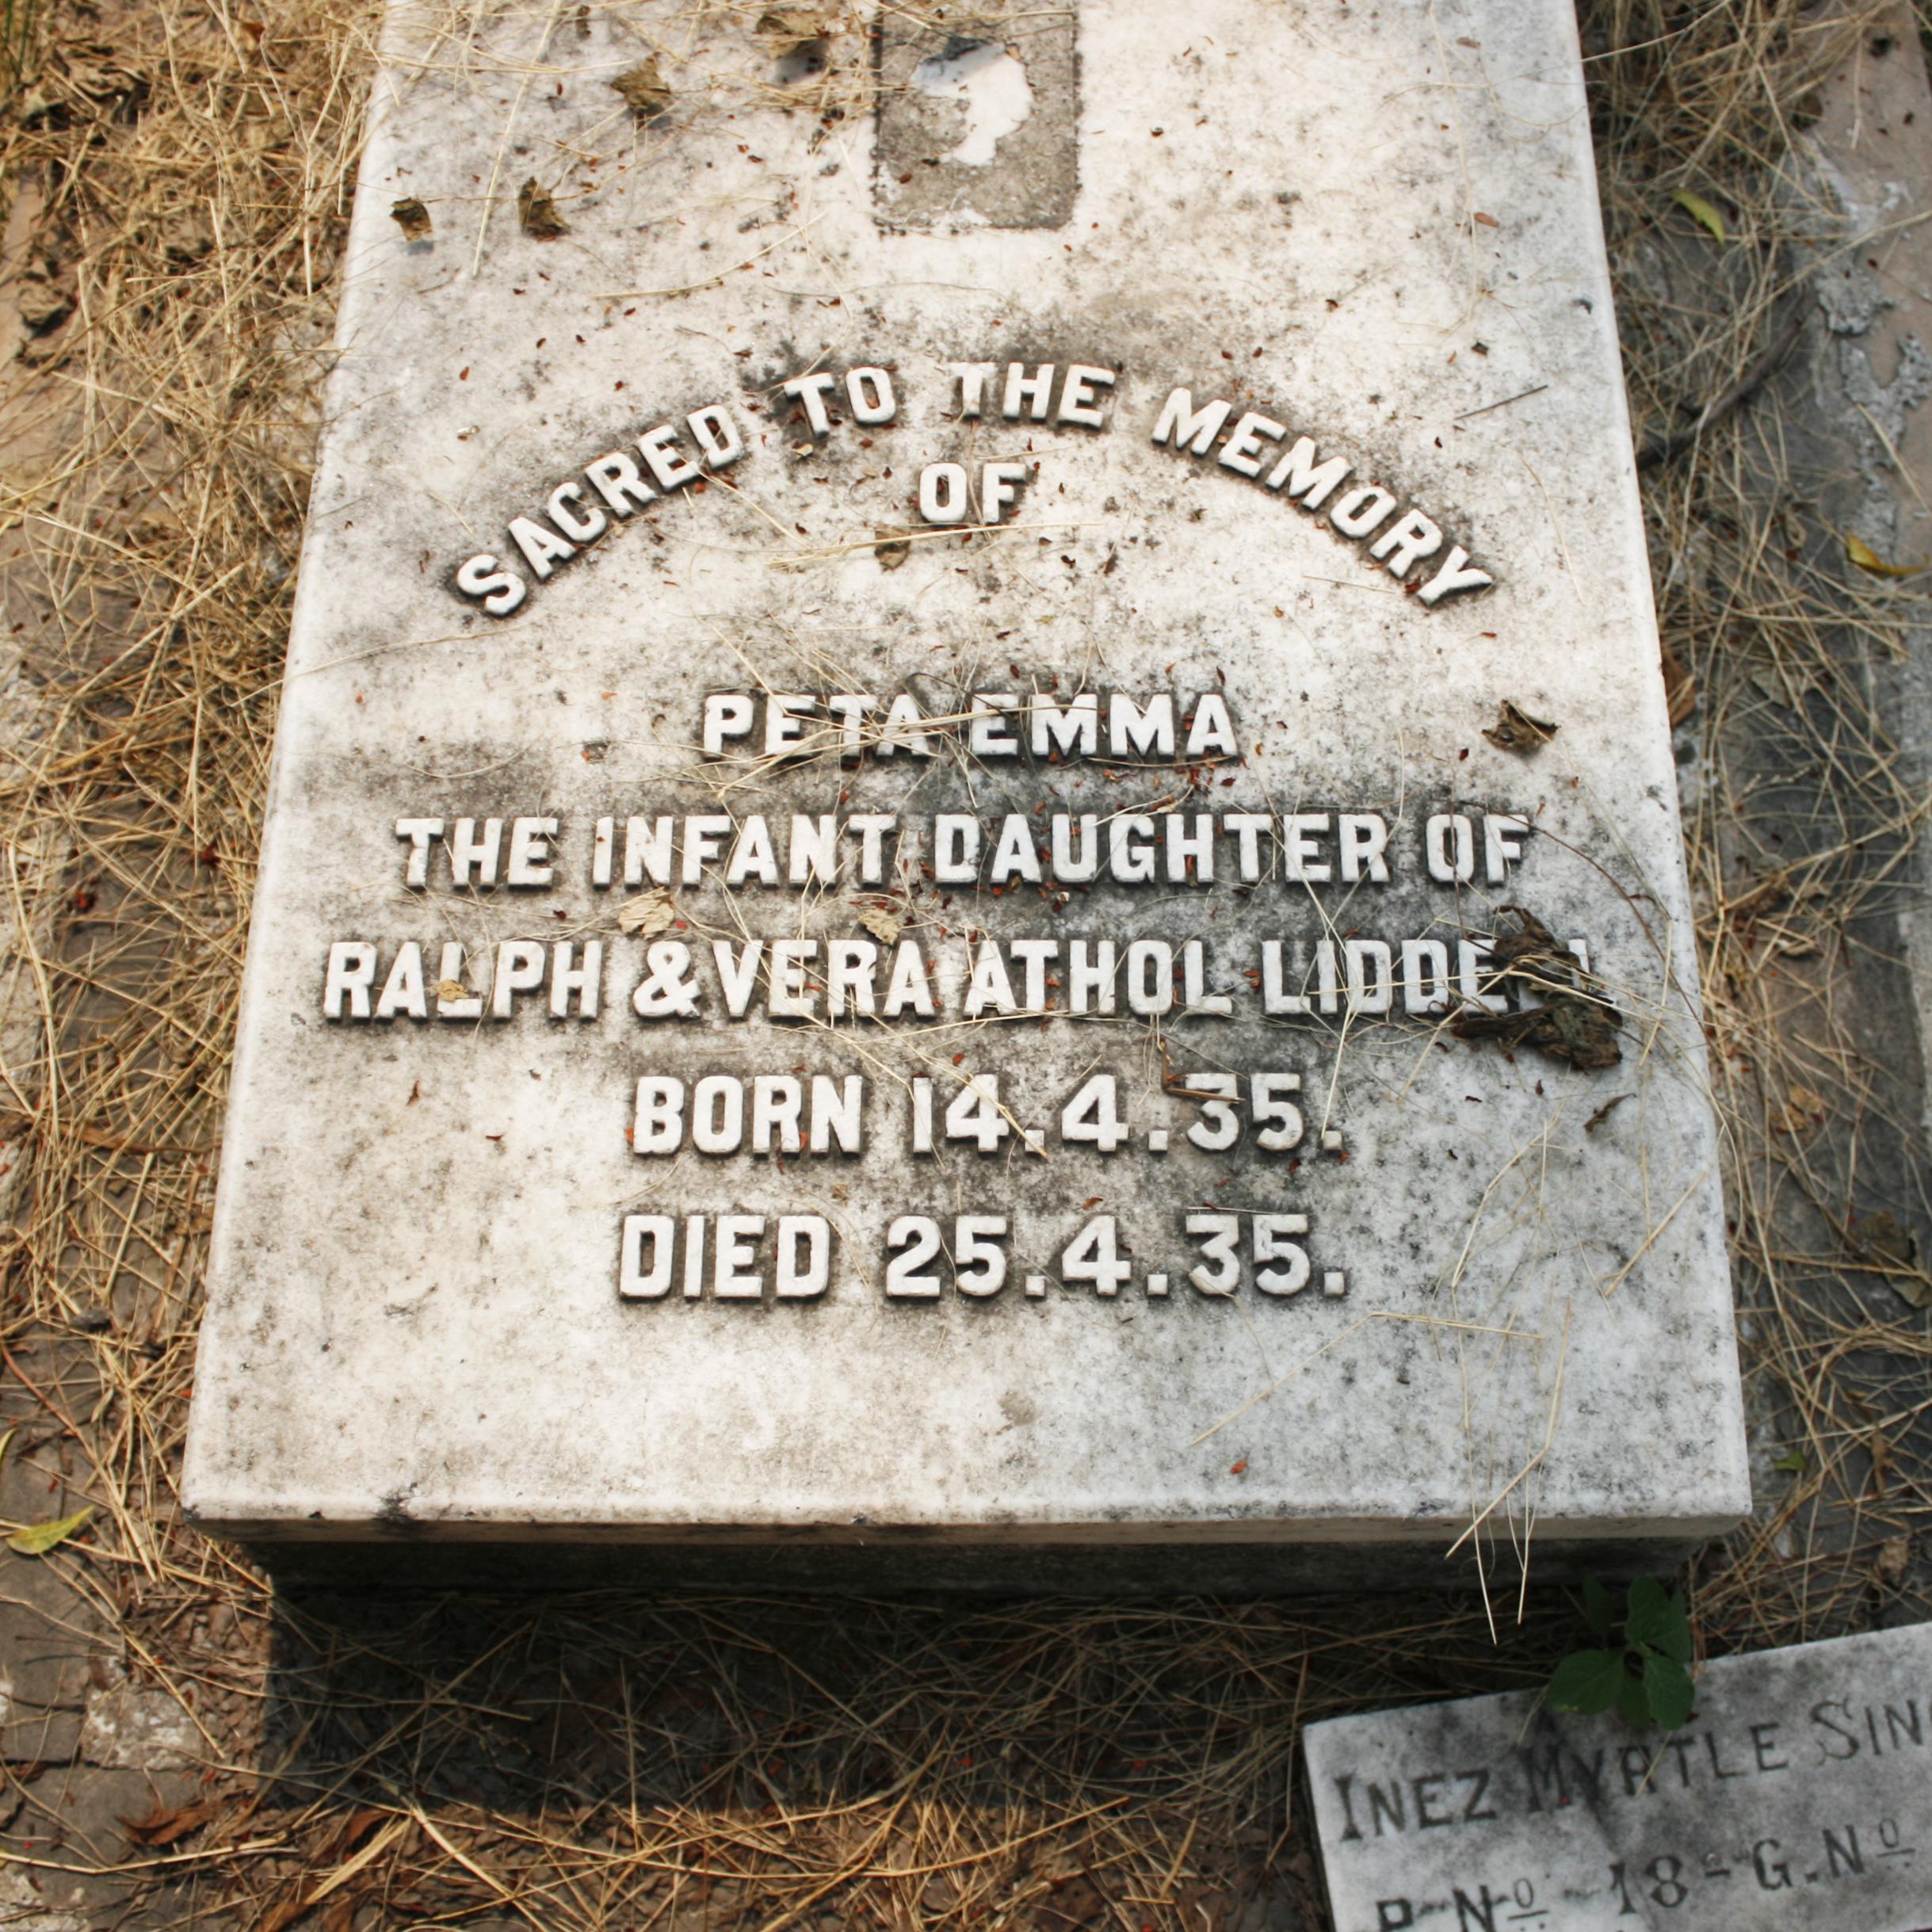 Sacred to the memory of Peta Emma